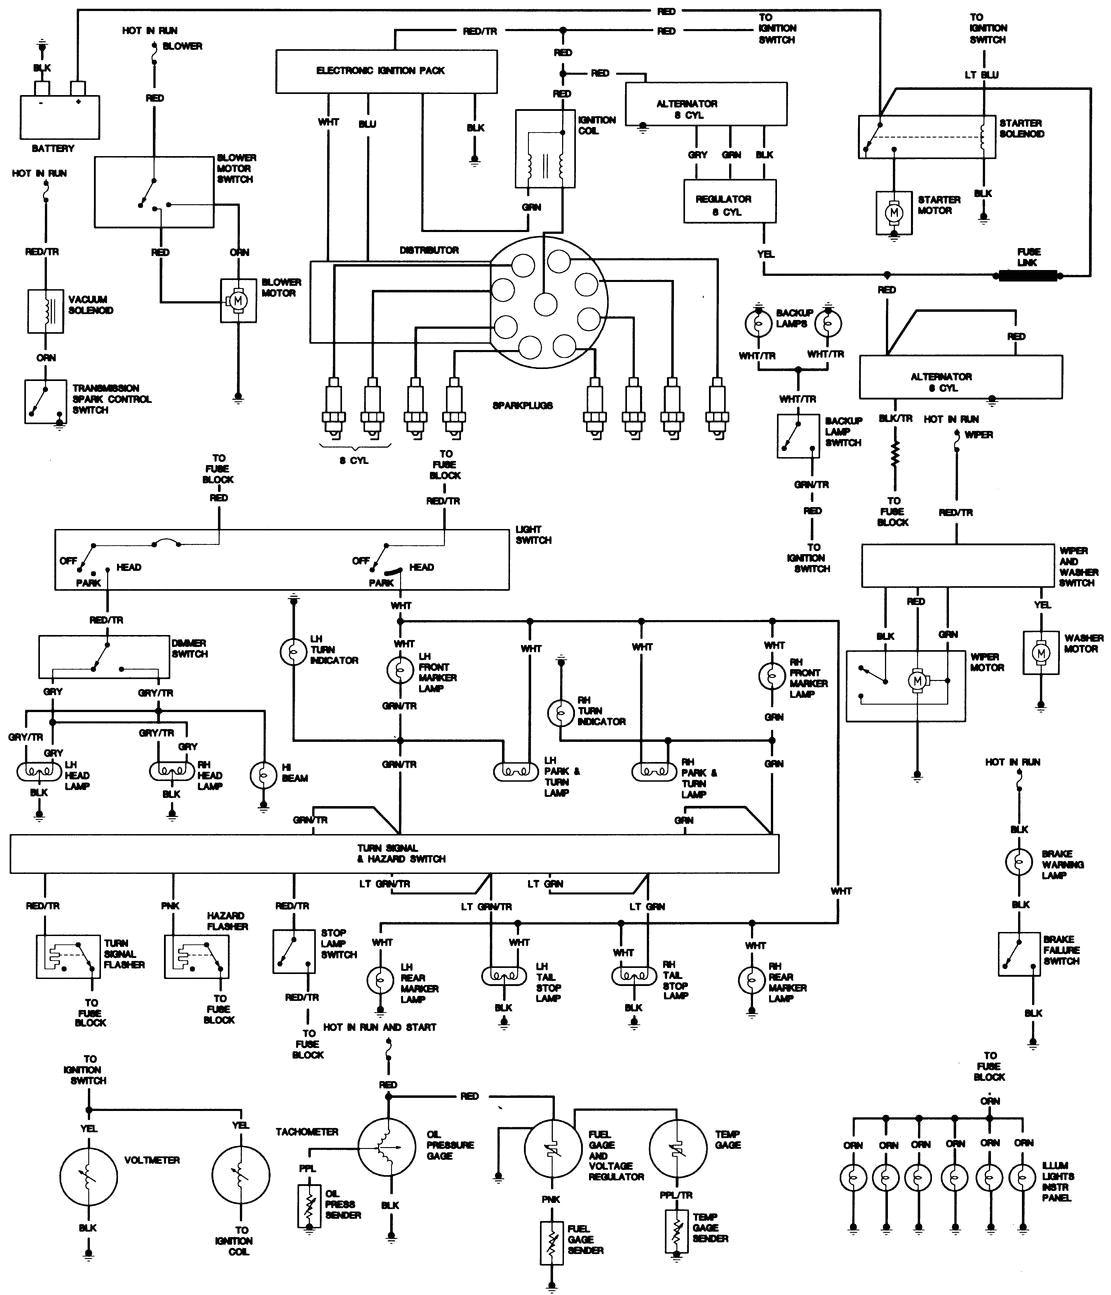 1980 cj5 wiring diagram furthermore jeep cj7 tachometer wiring wiring diagram for cj5 1963 1980 cj5